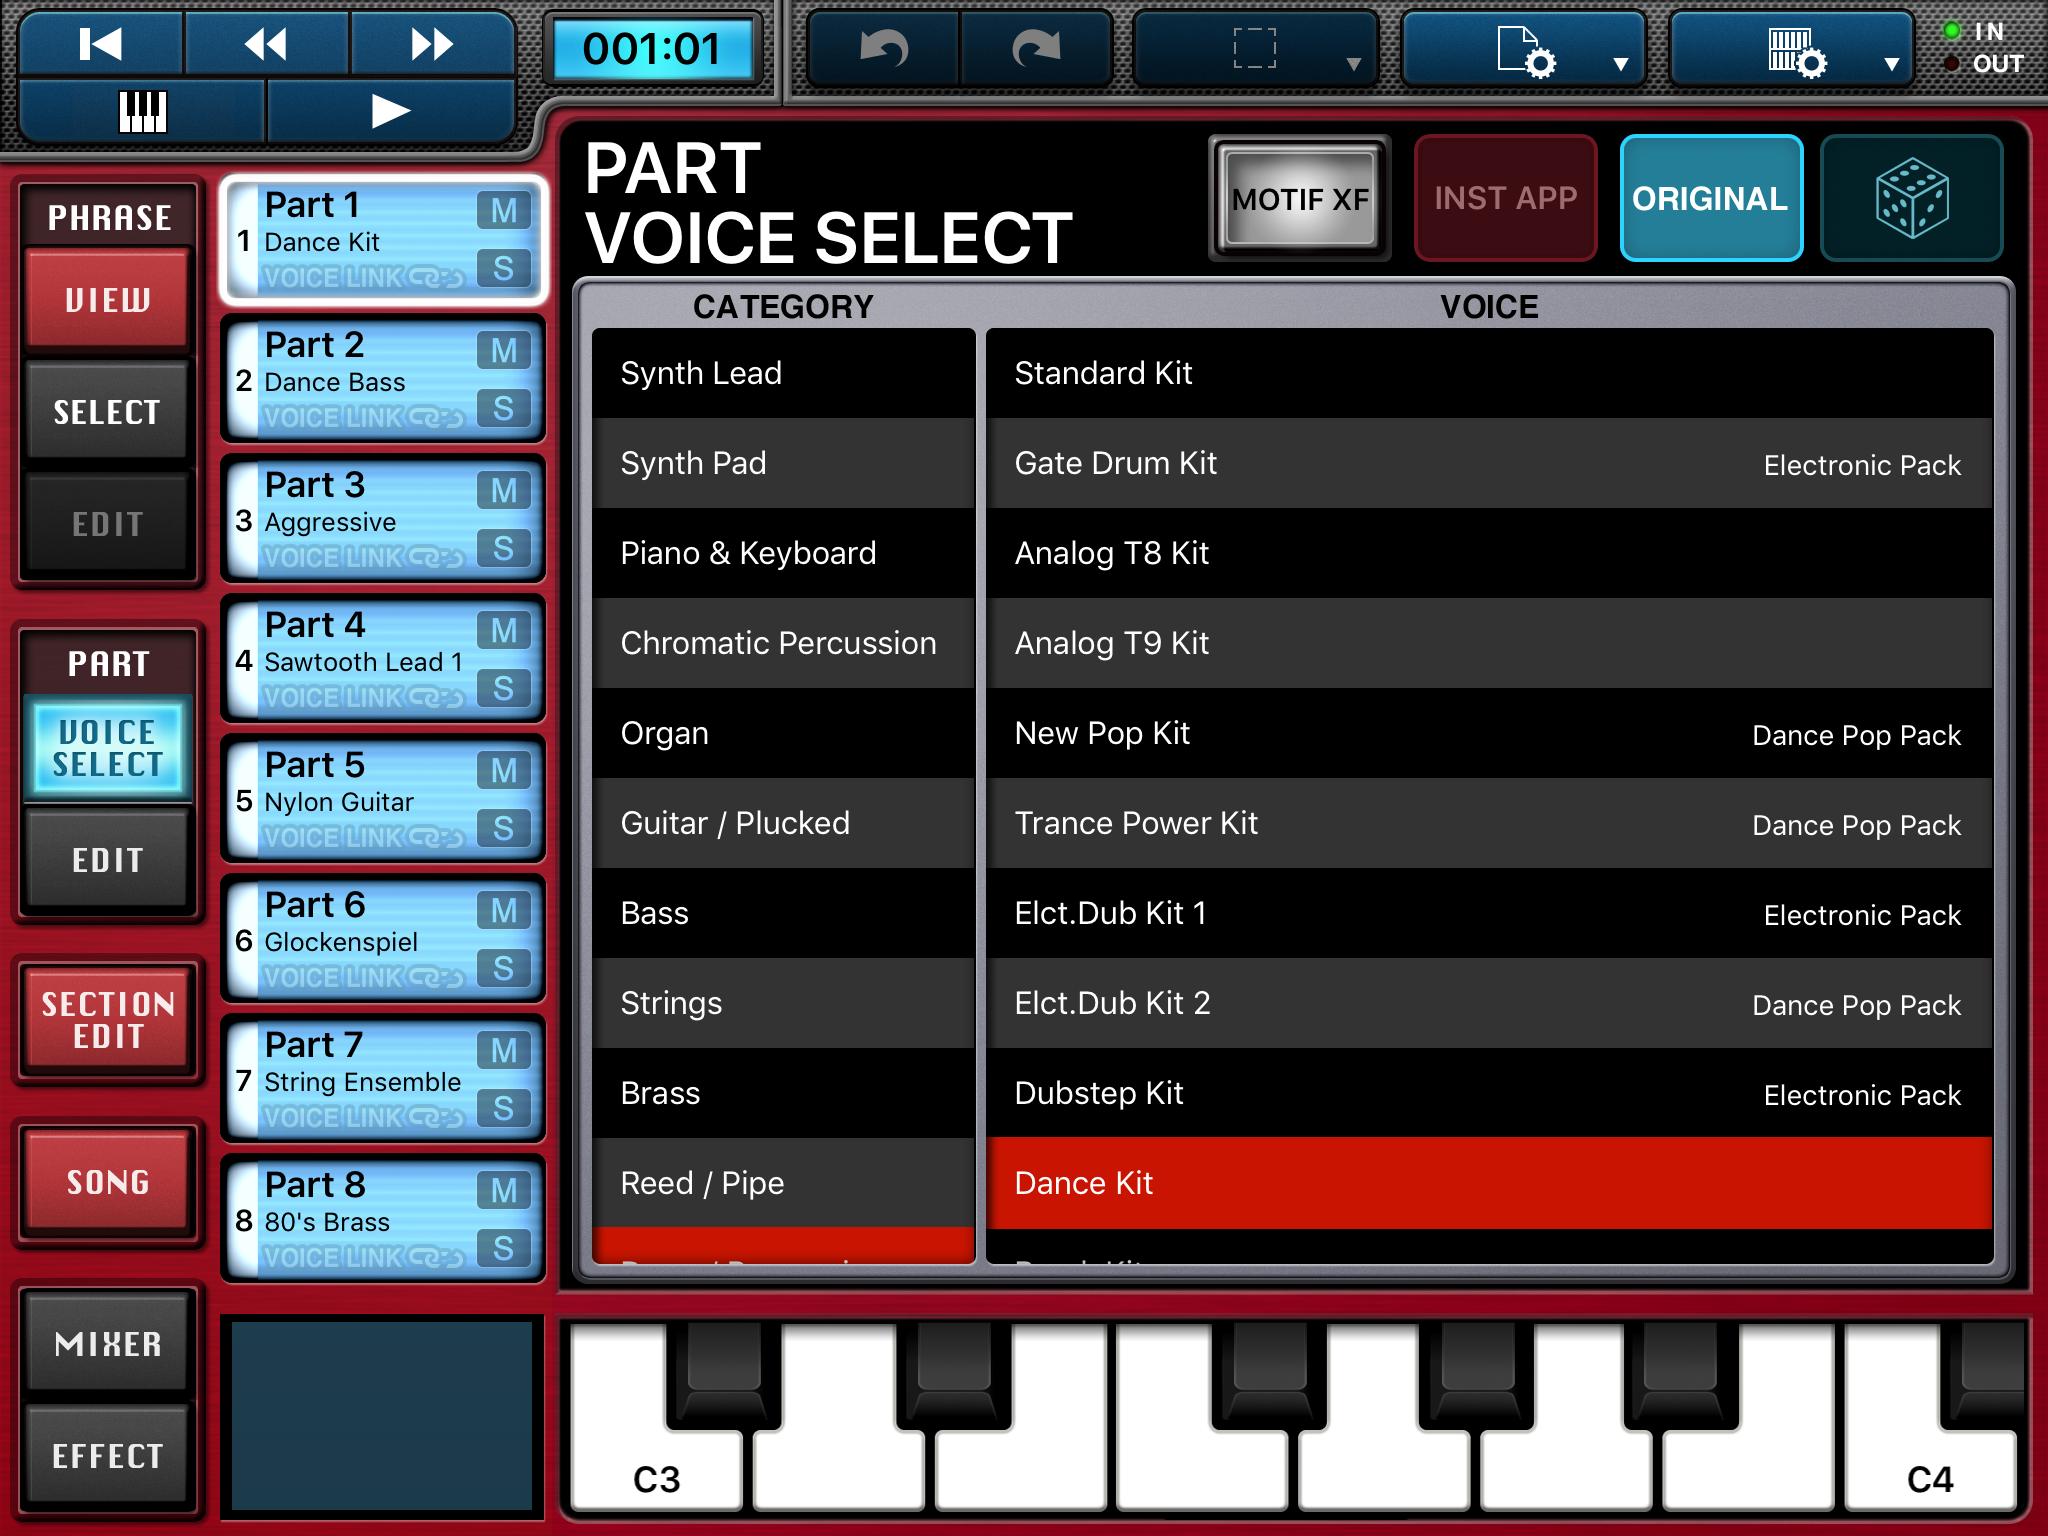 Yamaha MODX | Sand, software and sound - Part 2